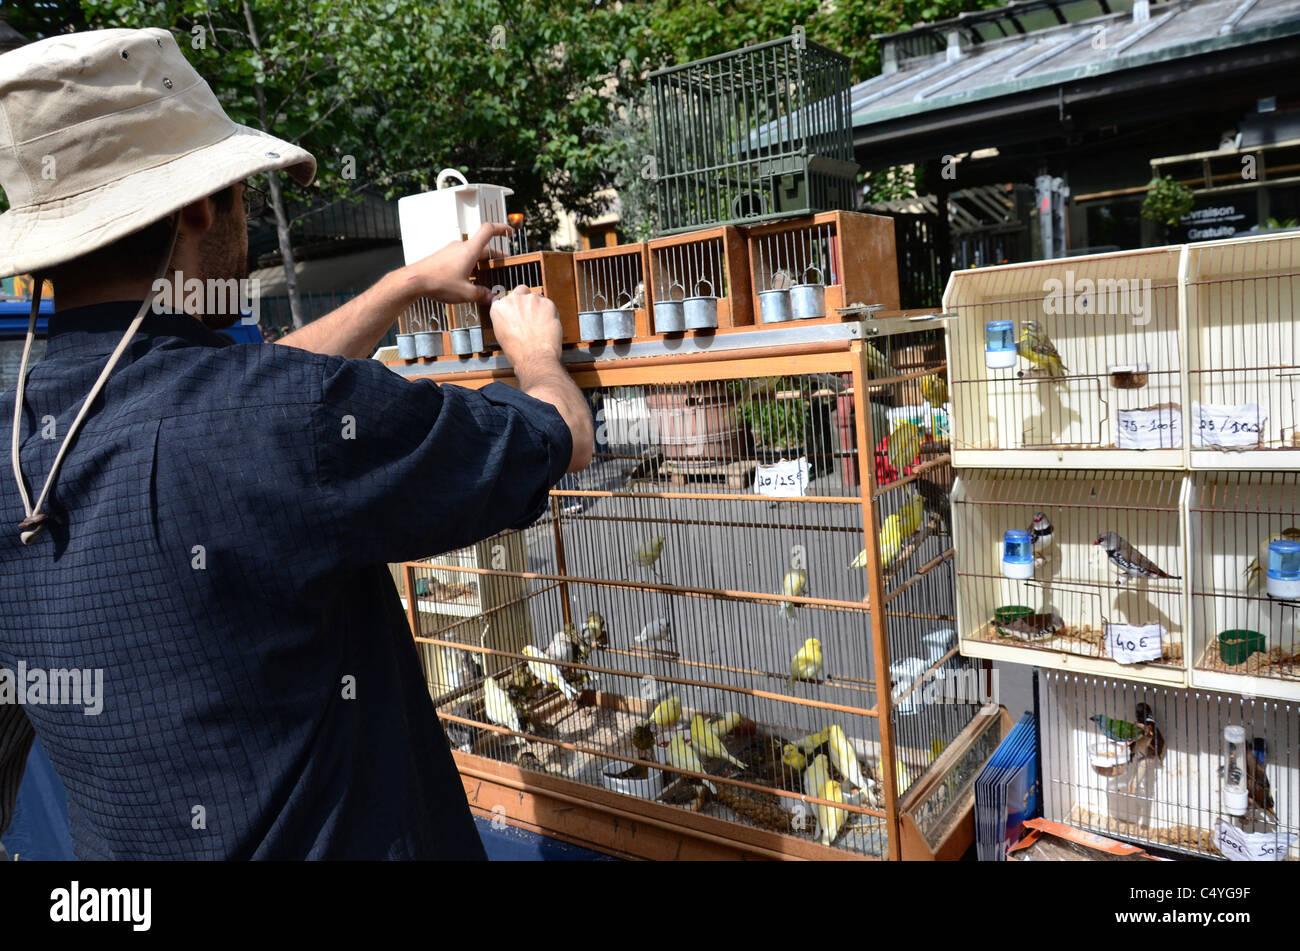 Marché aux Oiseaux: the Sunday morning bird market on the Ile St Louis in Paris, France. - Stock Image